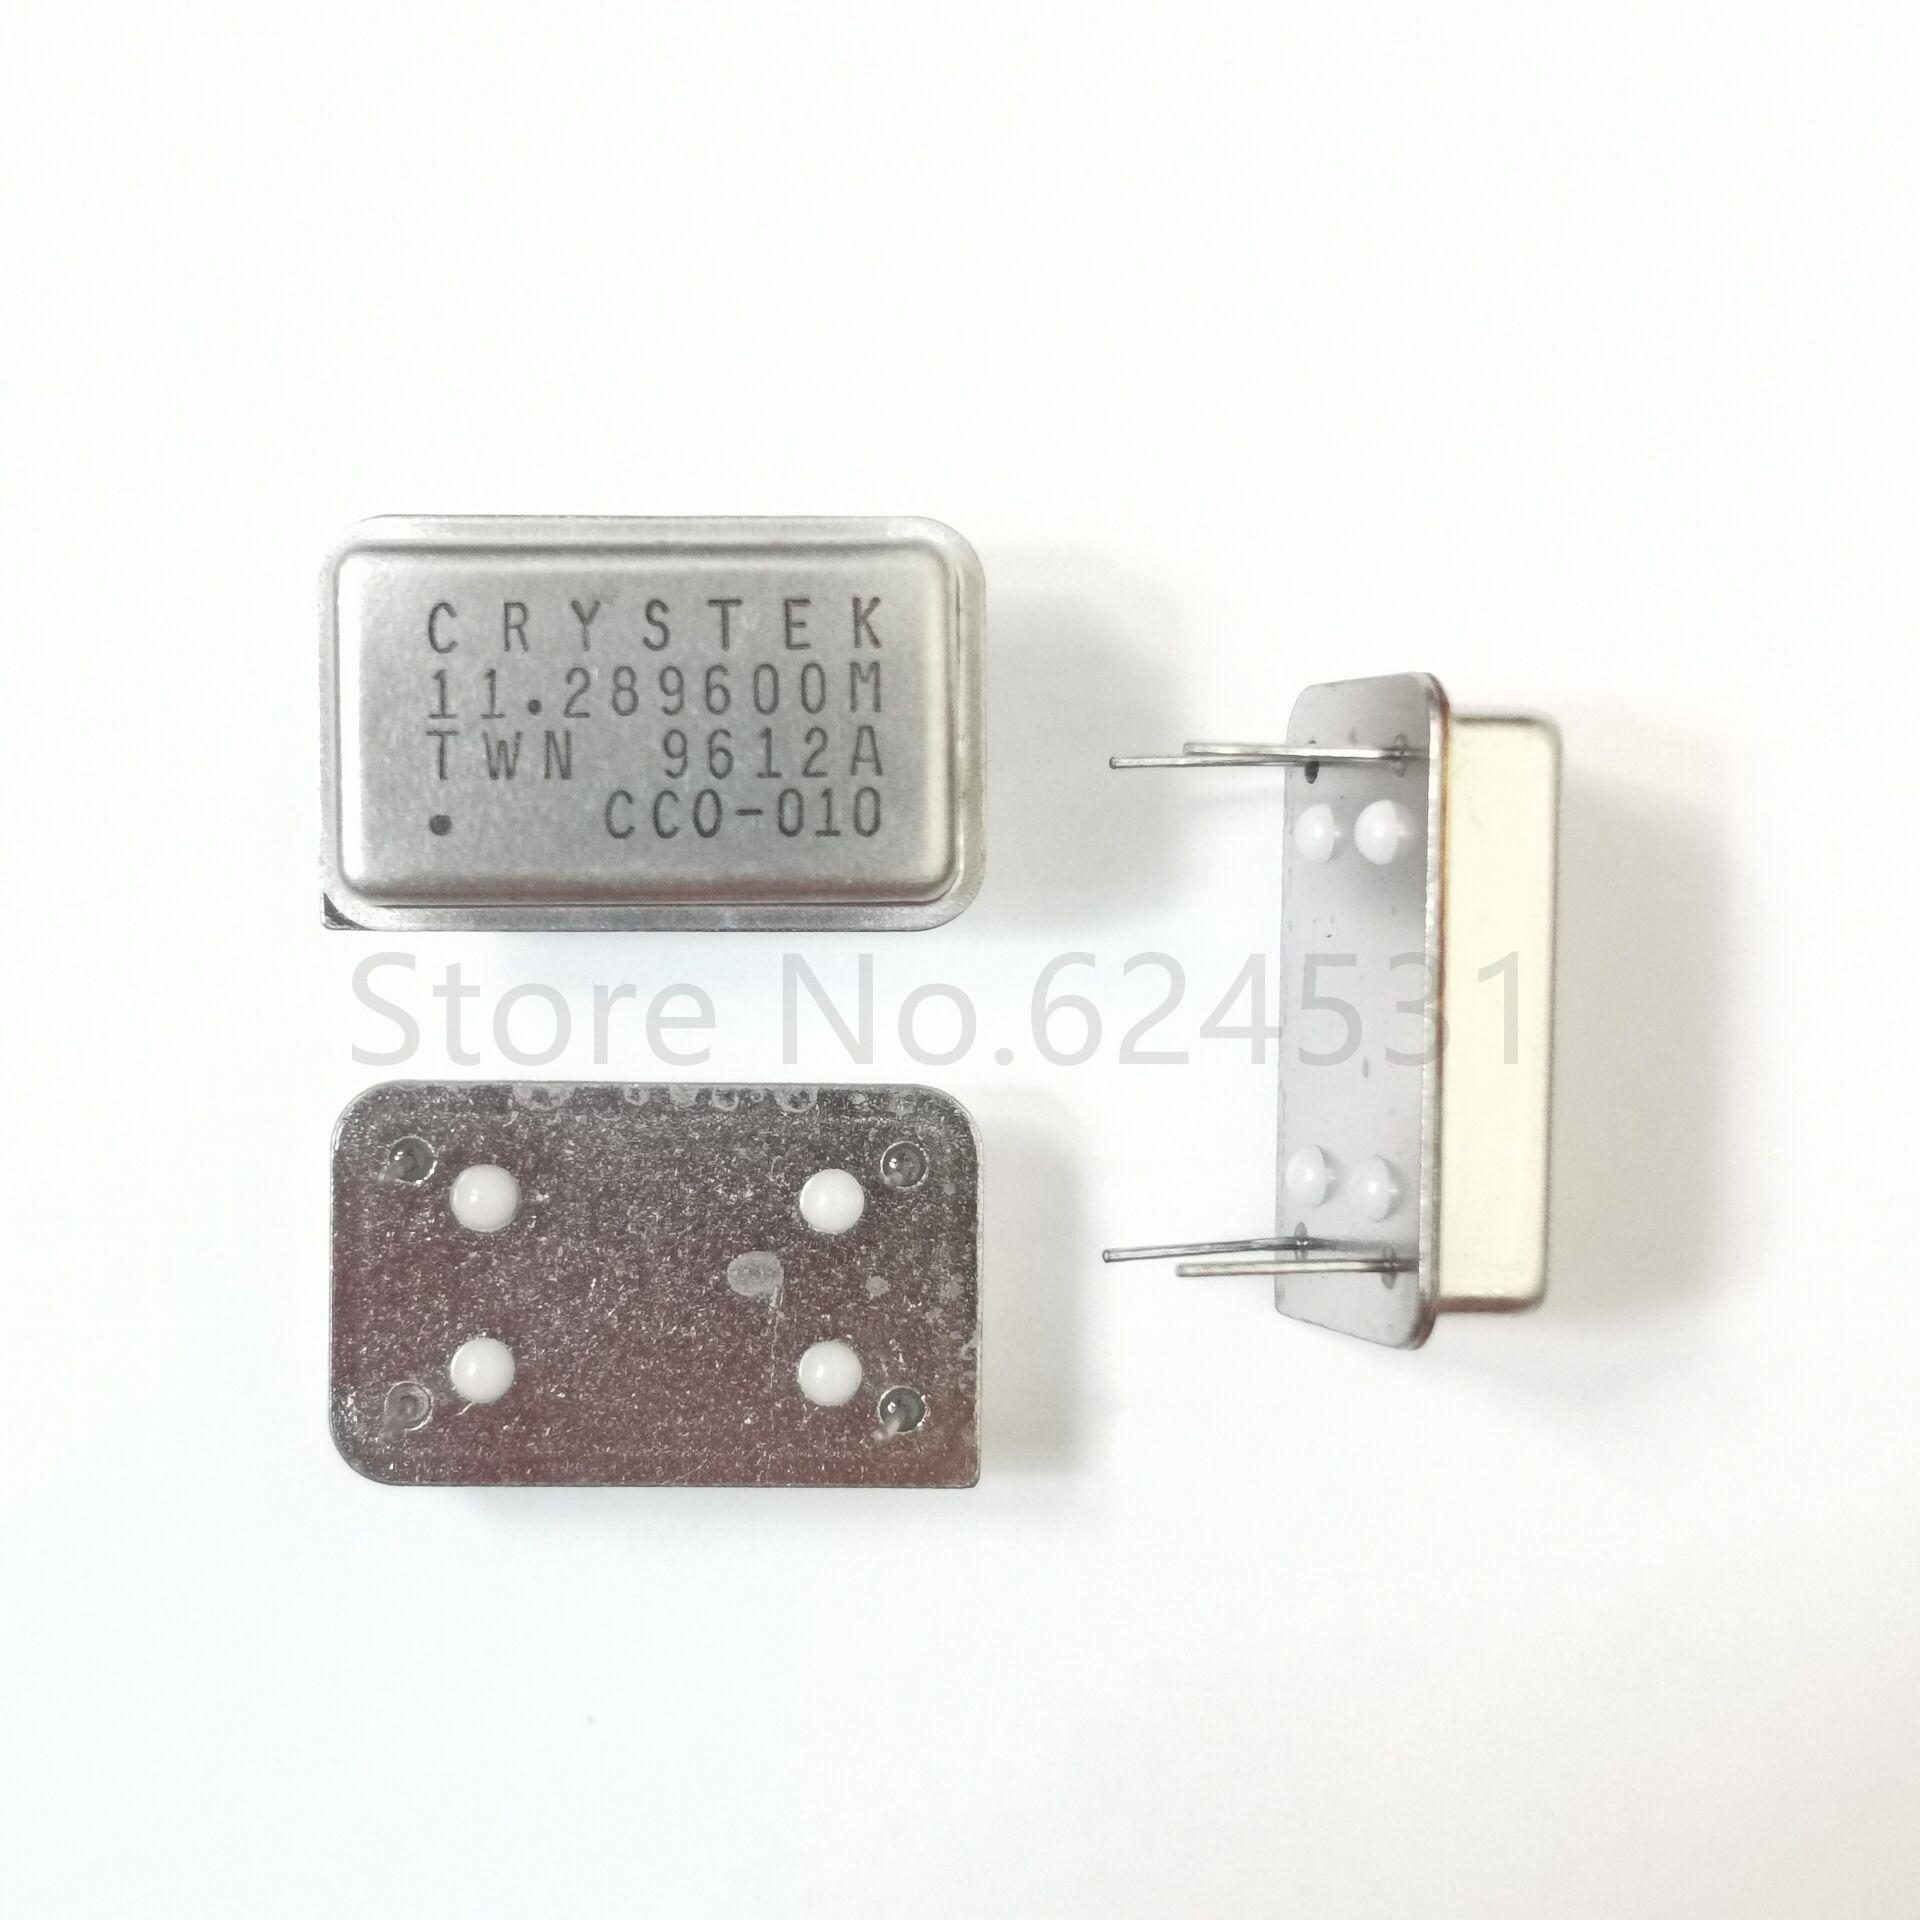 5pcs In-line Active Crystal OSC DIP-4 Rectangular Clock Vibration Full Size 11.2896MHZ